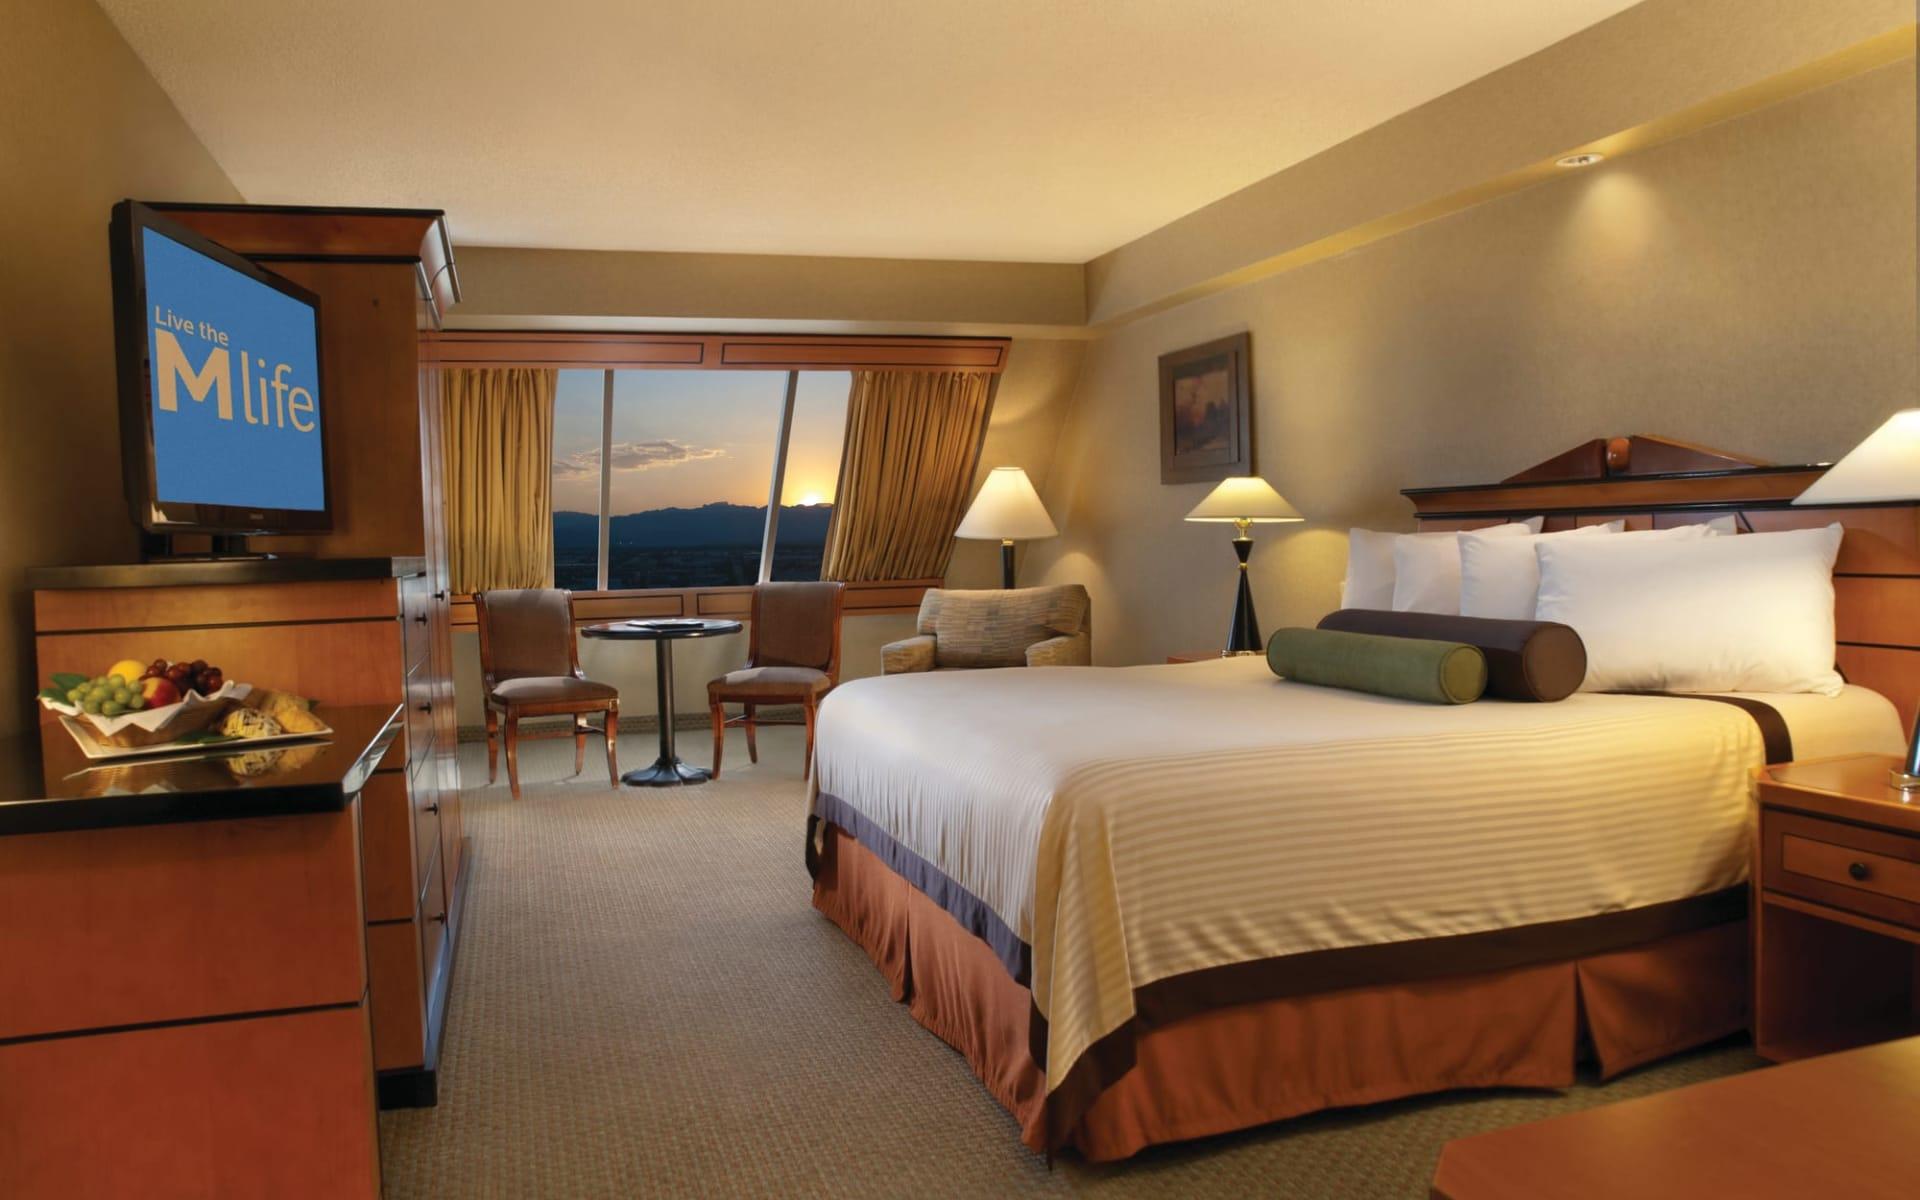 Luxor Resort & Casino in Las Vegas:  Luxor Resort - Pyramid Deluxe King Room